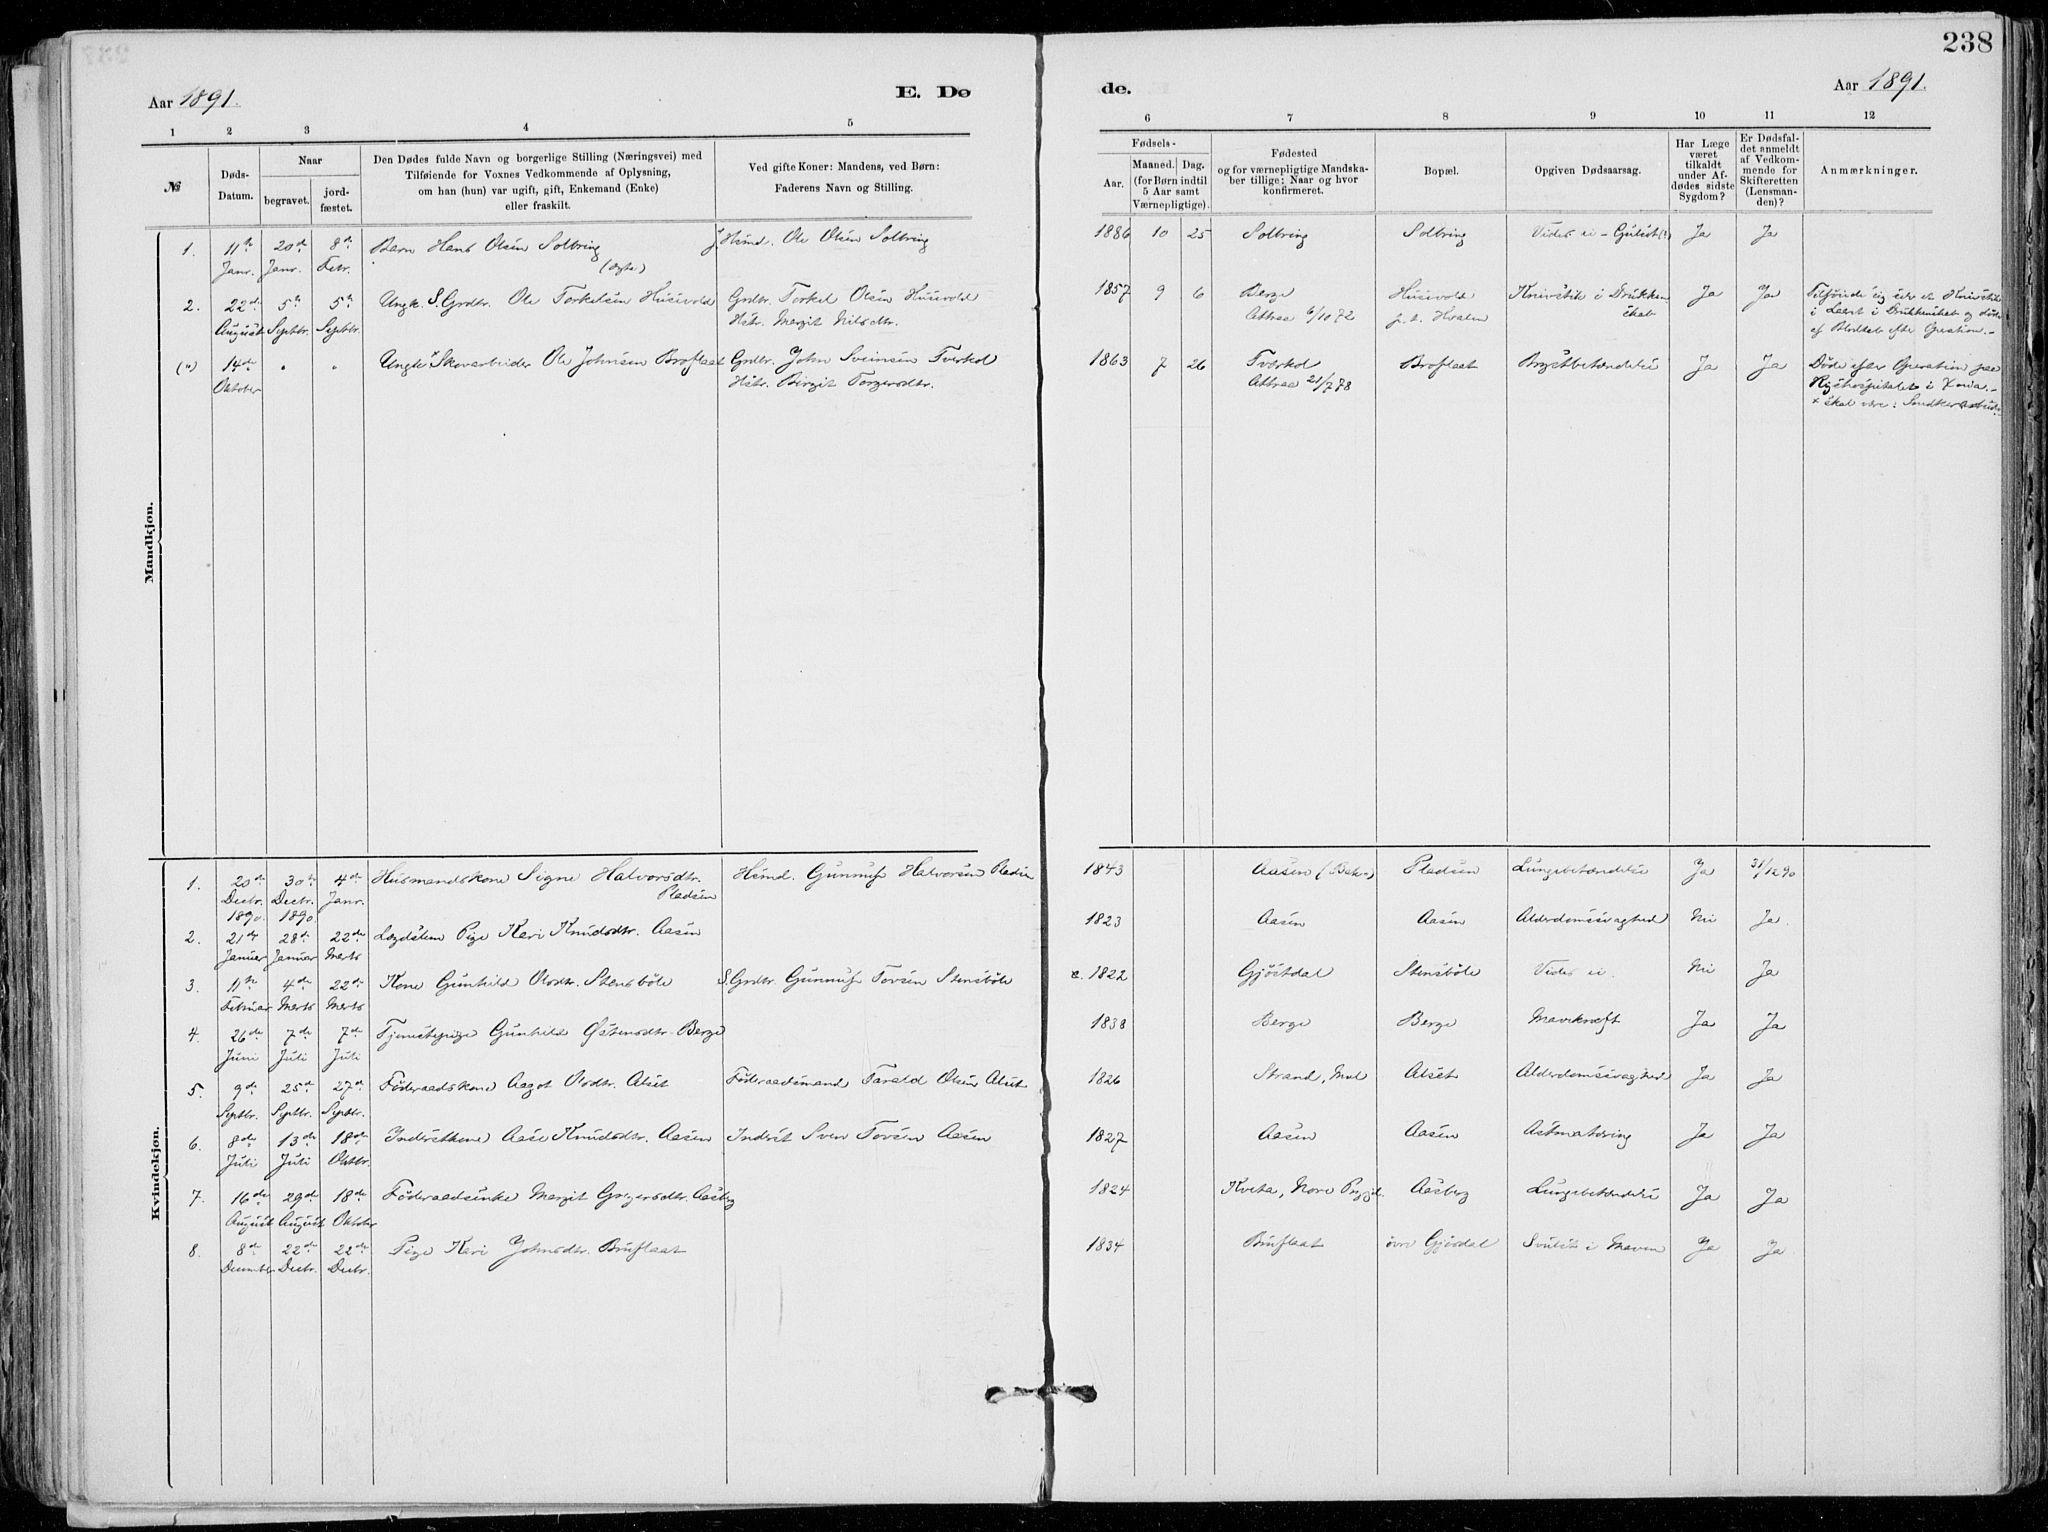 SAKO, Tinn kirkebøker, F/Fa/L0007: Ministerialbok nr. I 7, 1878-1922, s. 238